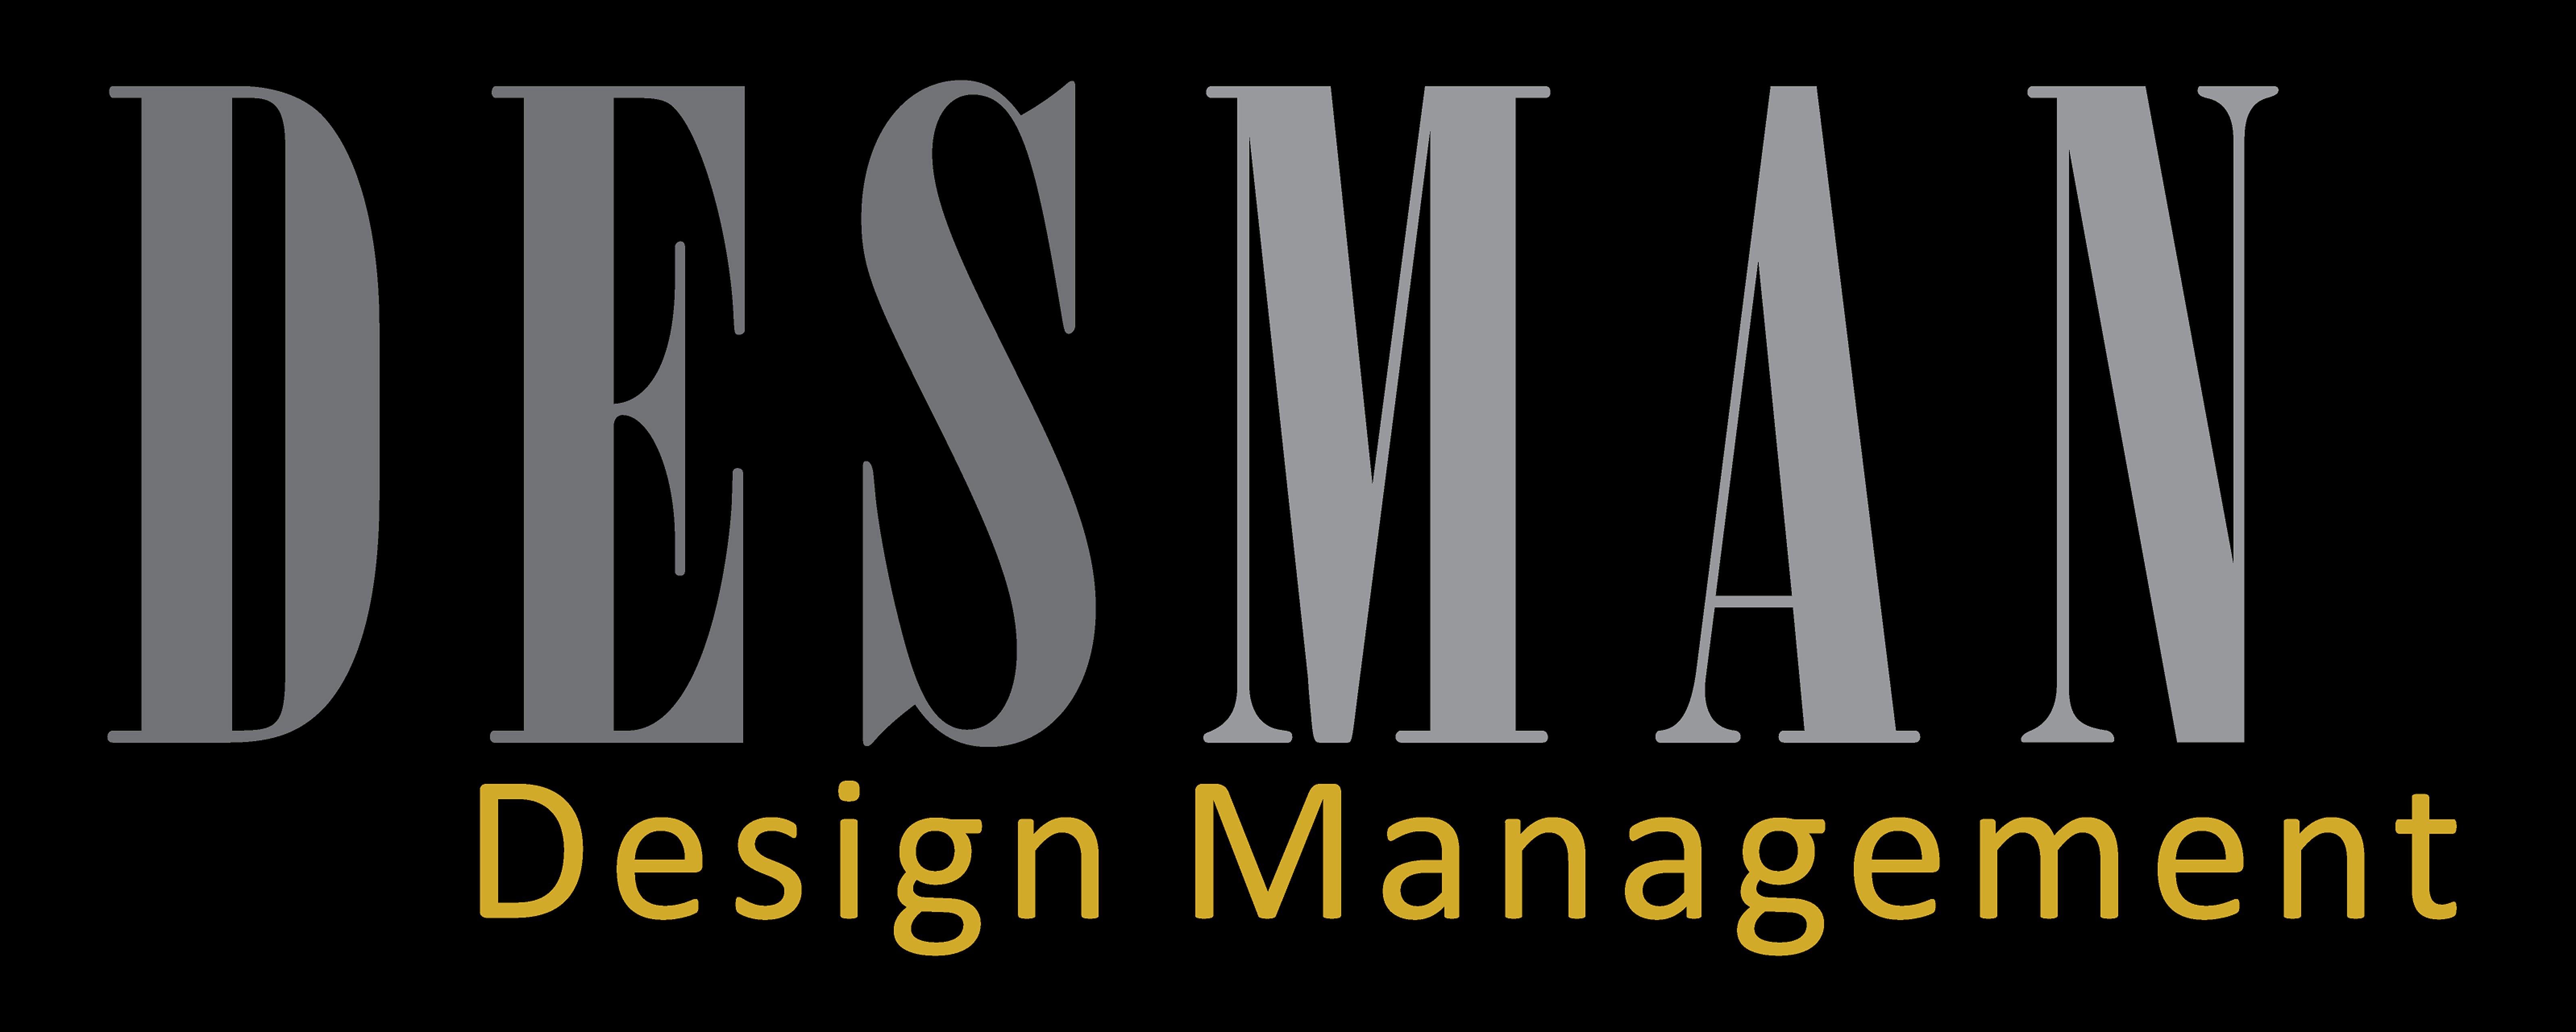 Desman Design Management